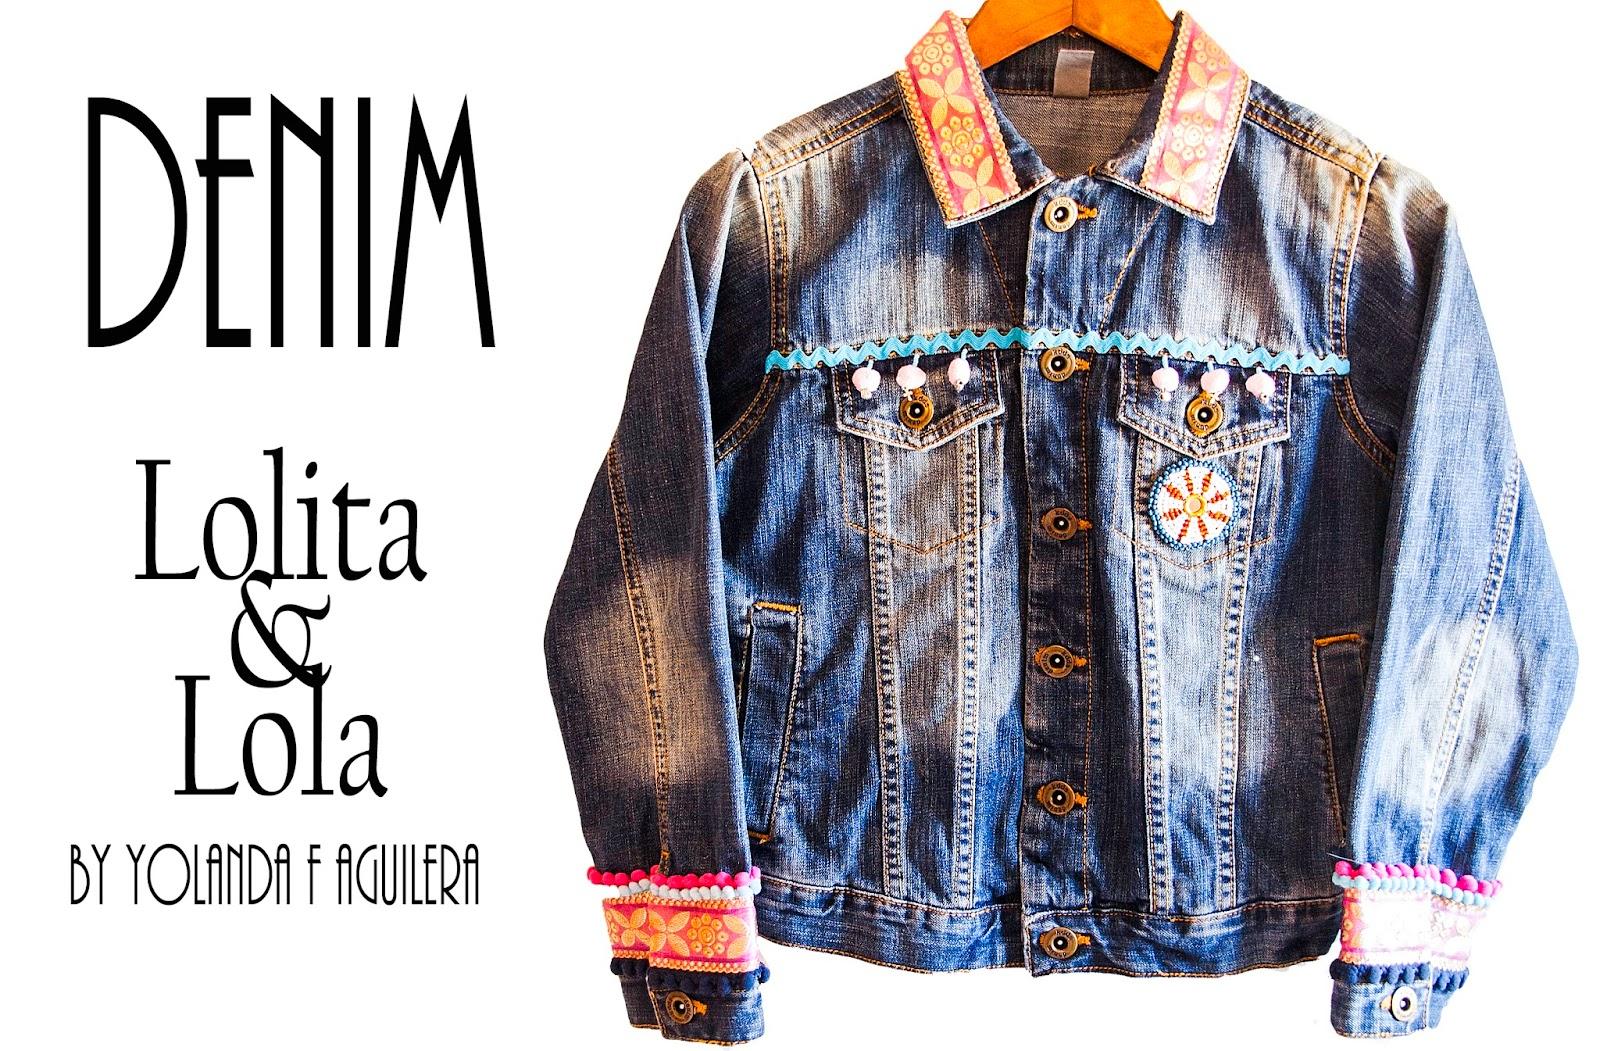 bdee14daeb Cazadora vaquera bordado lolitaylola Embroidered denim jacket lolitaylola